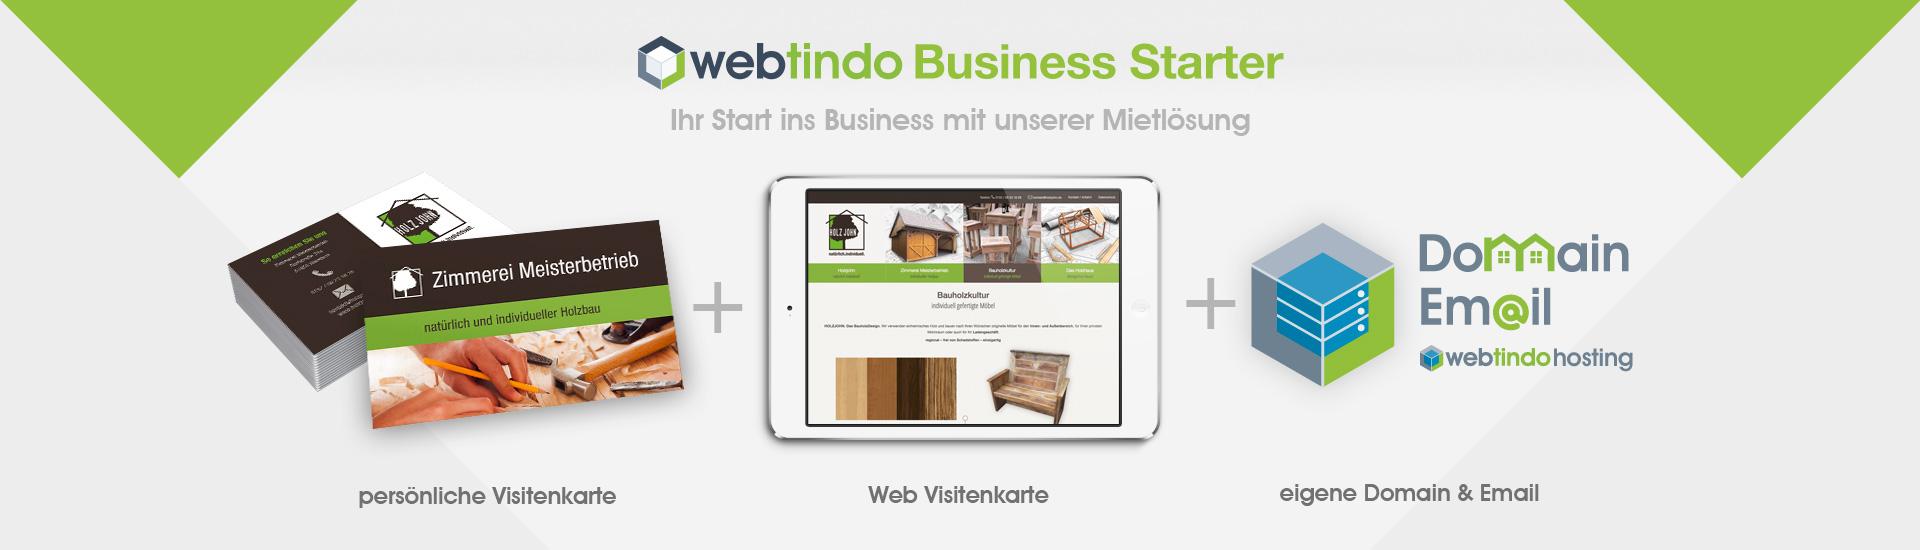 Visitenkarte Starter Webtindo